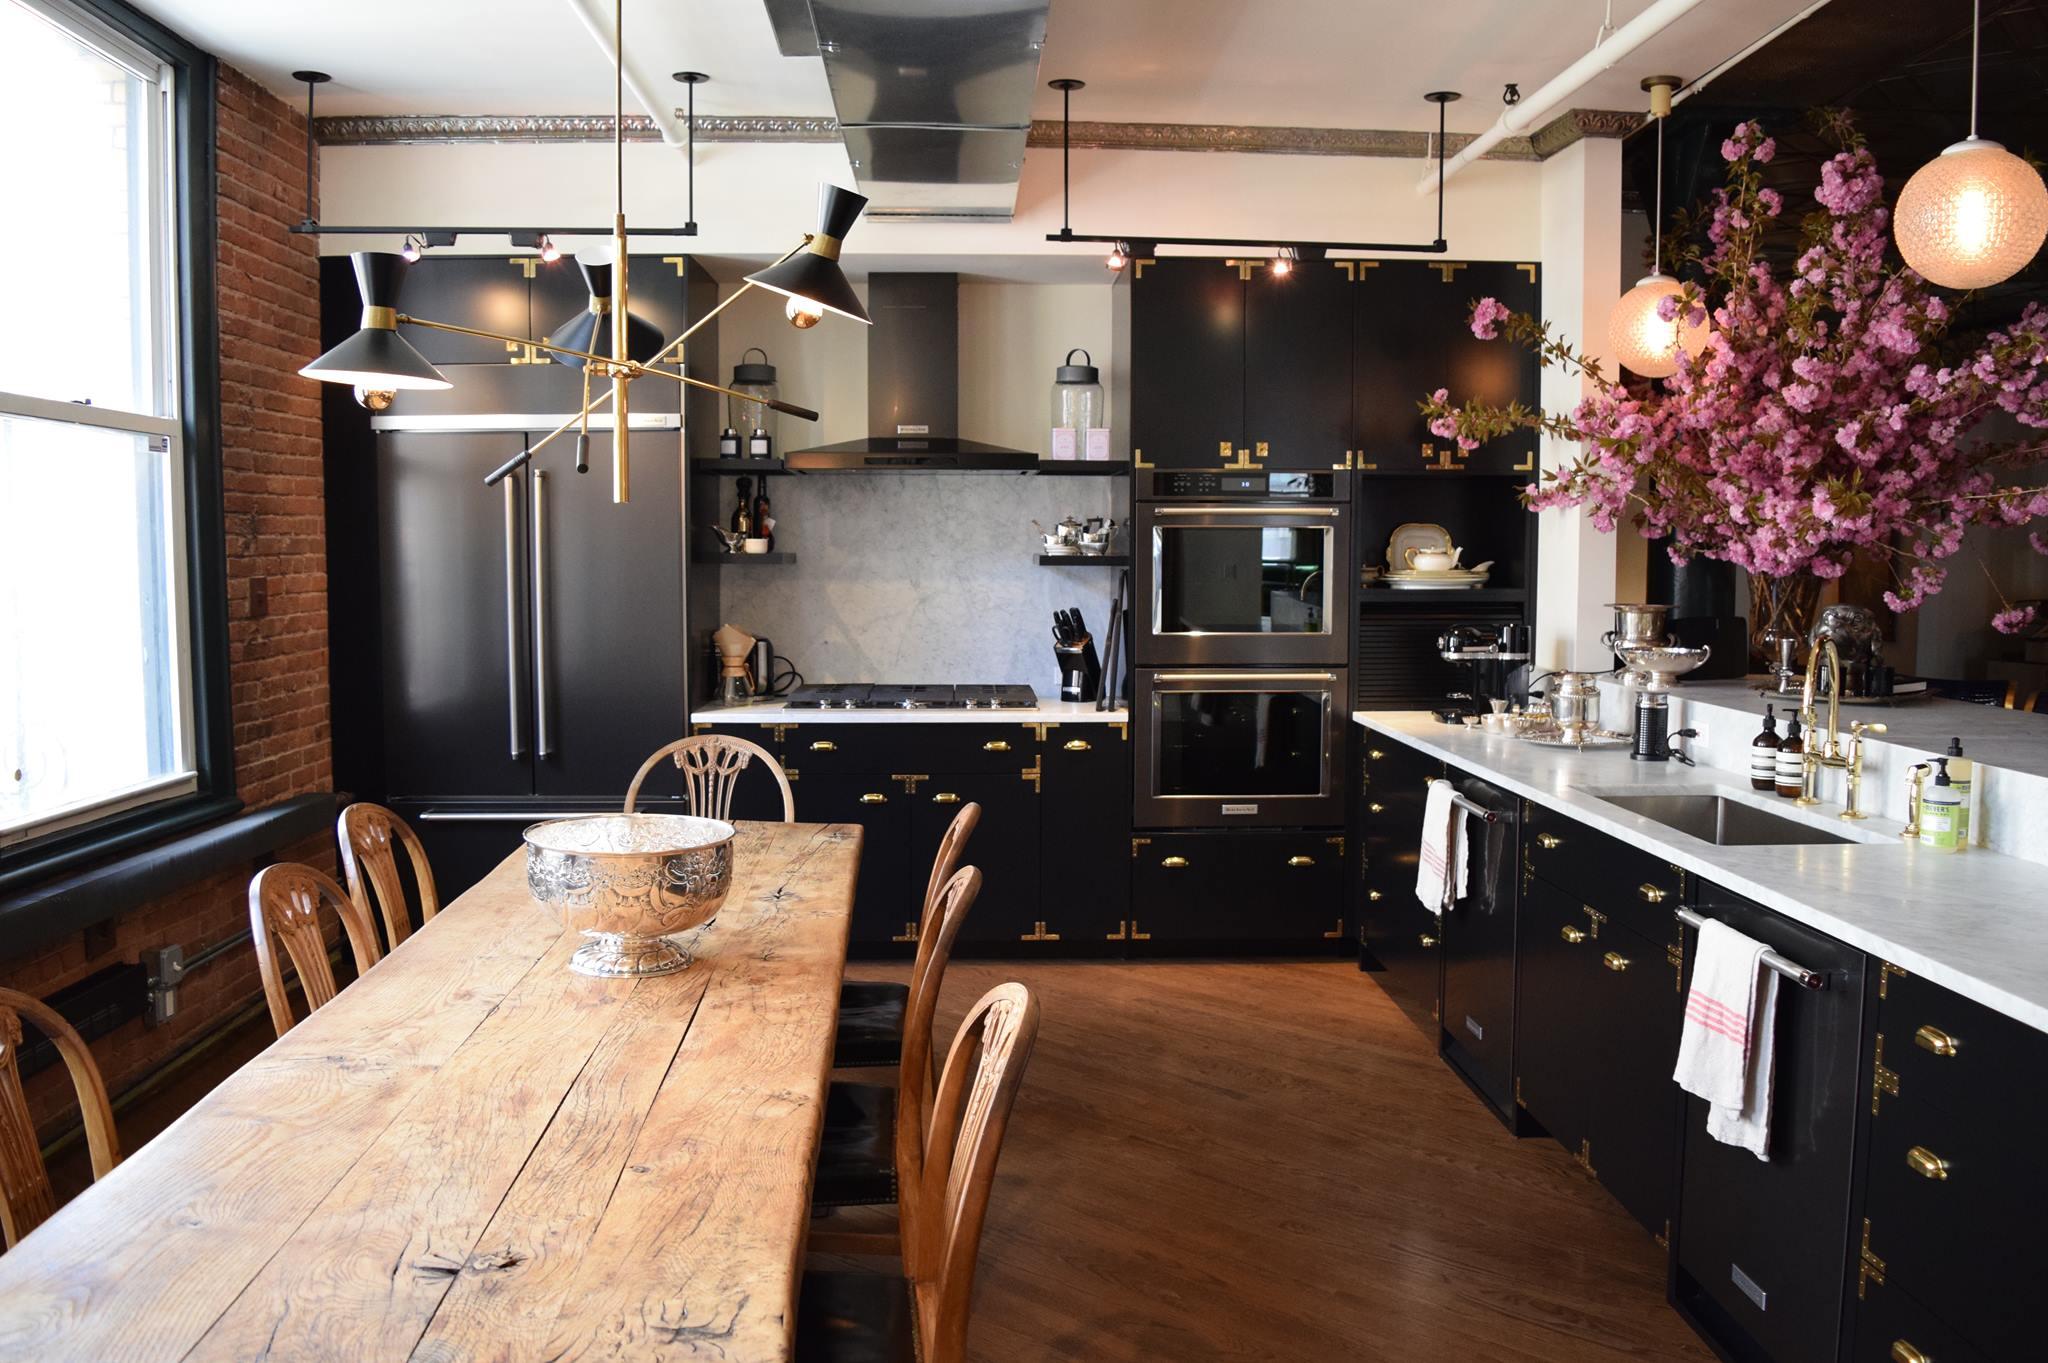 kitchenaid black stainless. kitchenaid black stainless steel appliances kitchenaid